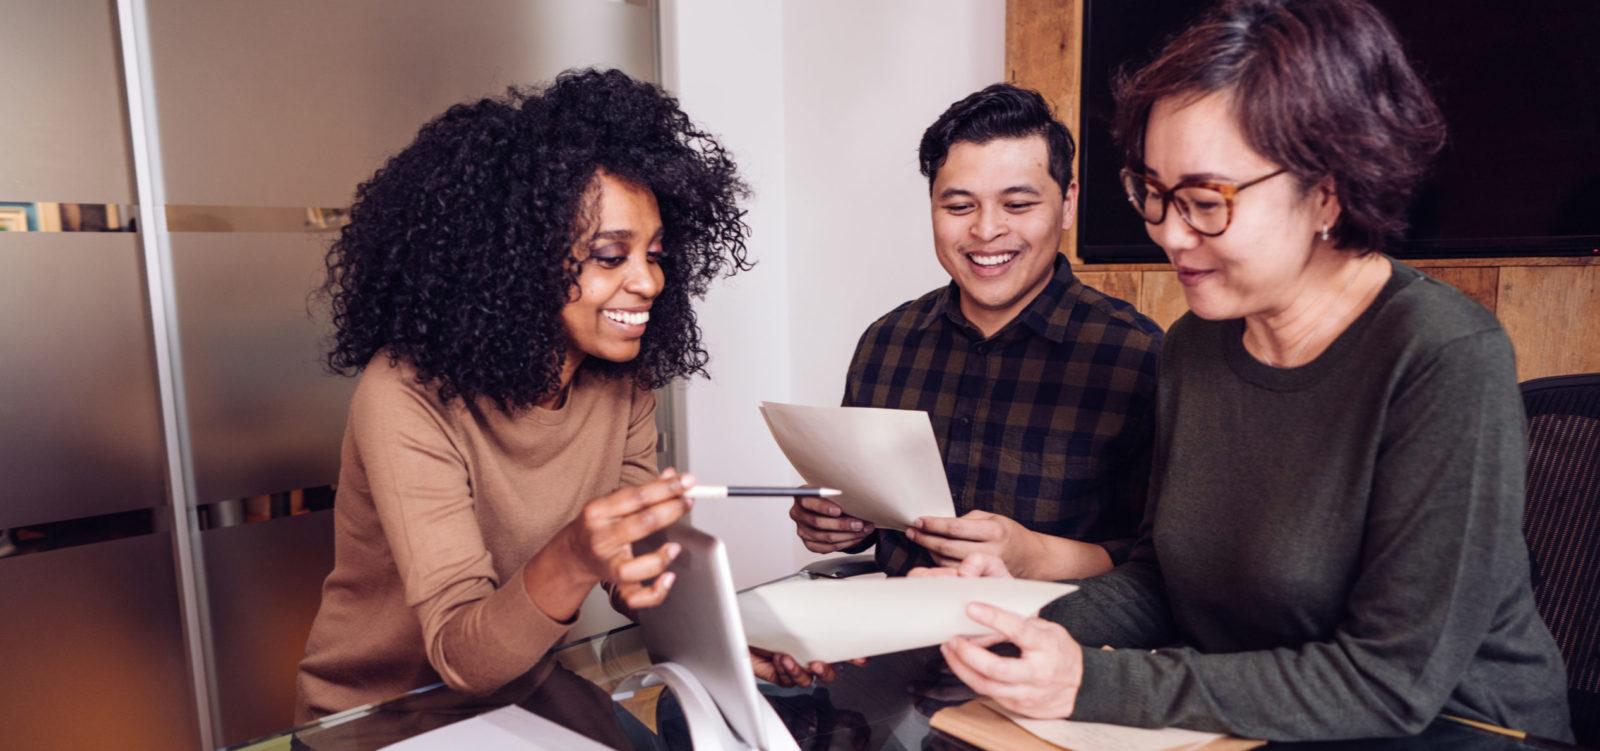 Applying for mortgage renewal